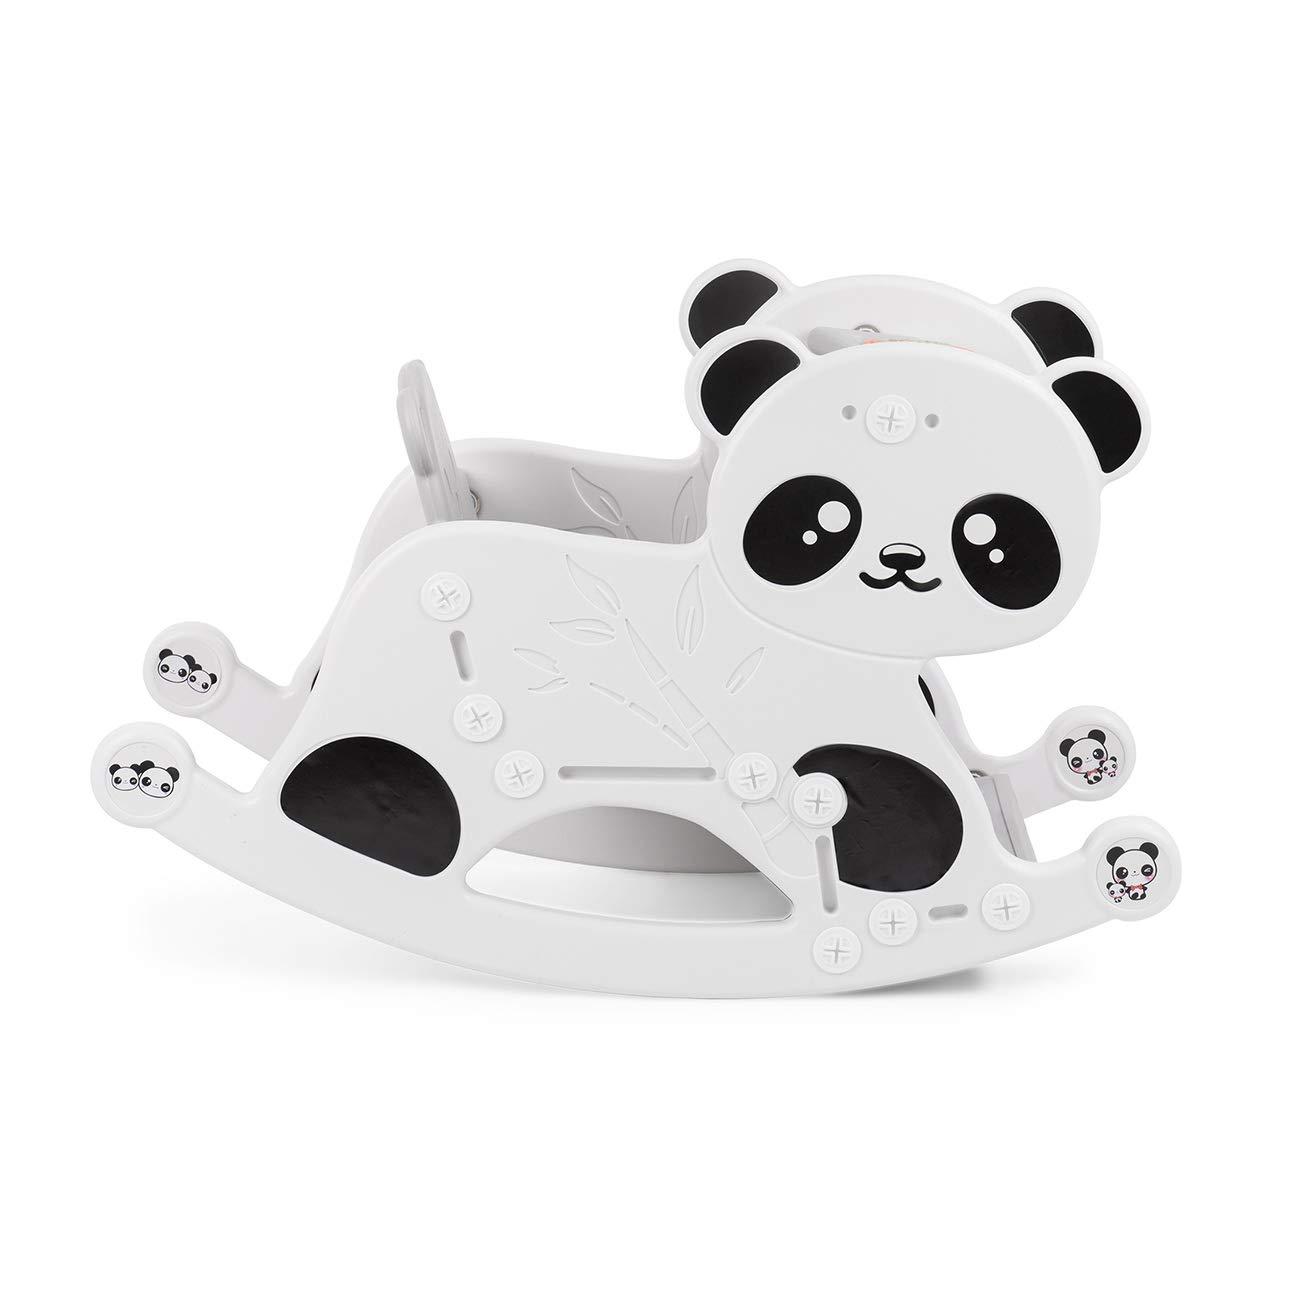 Vivo Sedia A Panda Infanzia Baby Dondolo Cavallo Animale 0nPOXNk8wZ